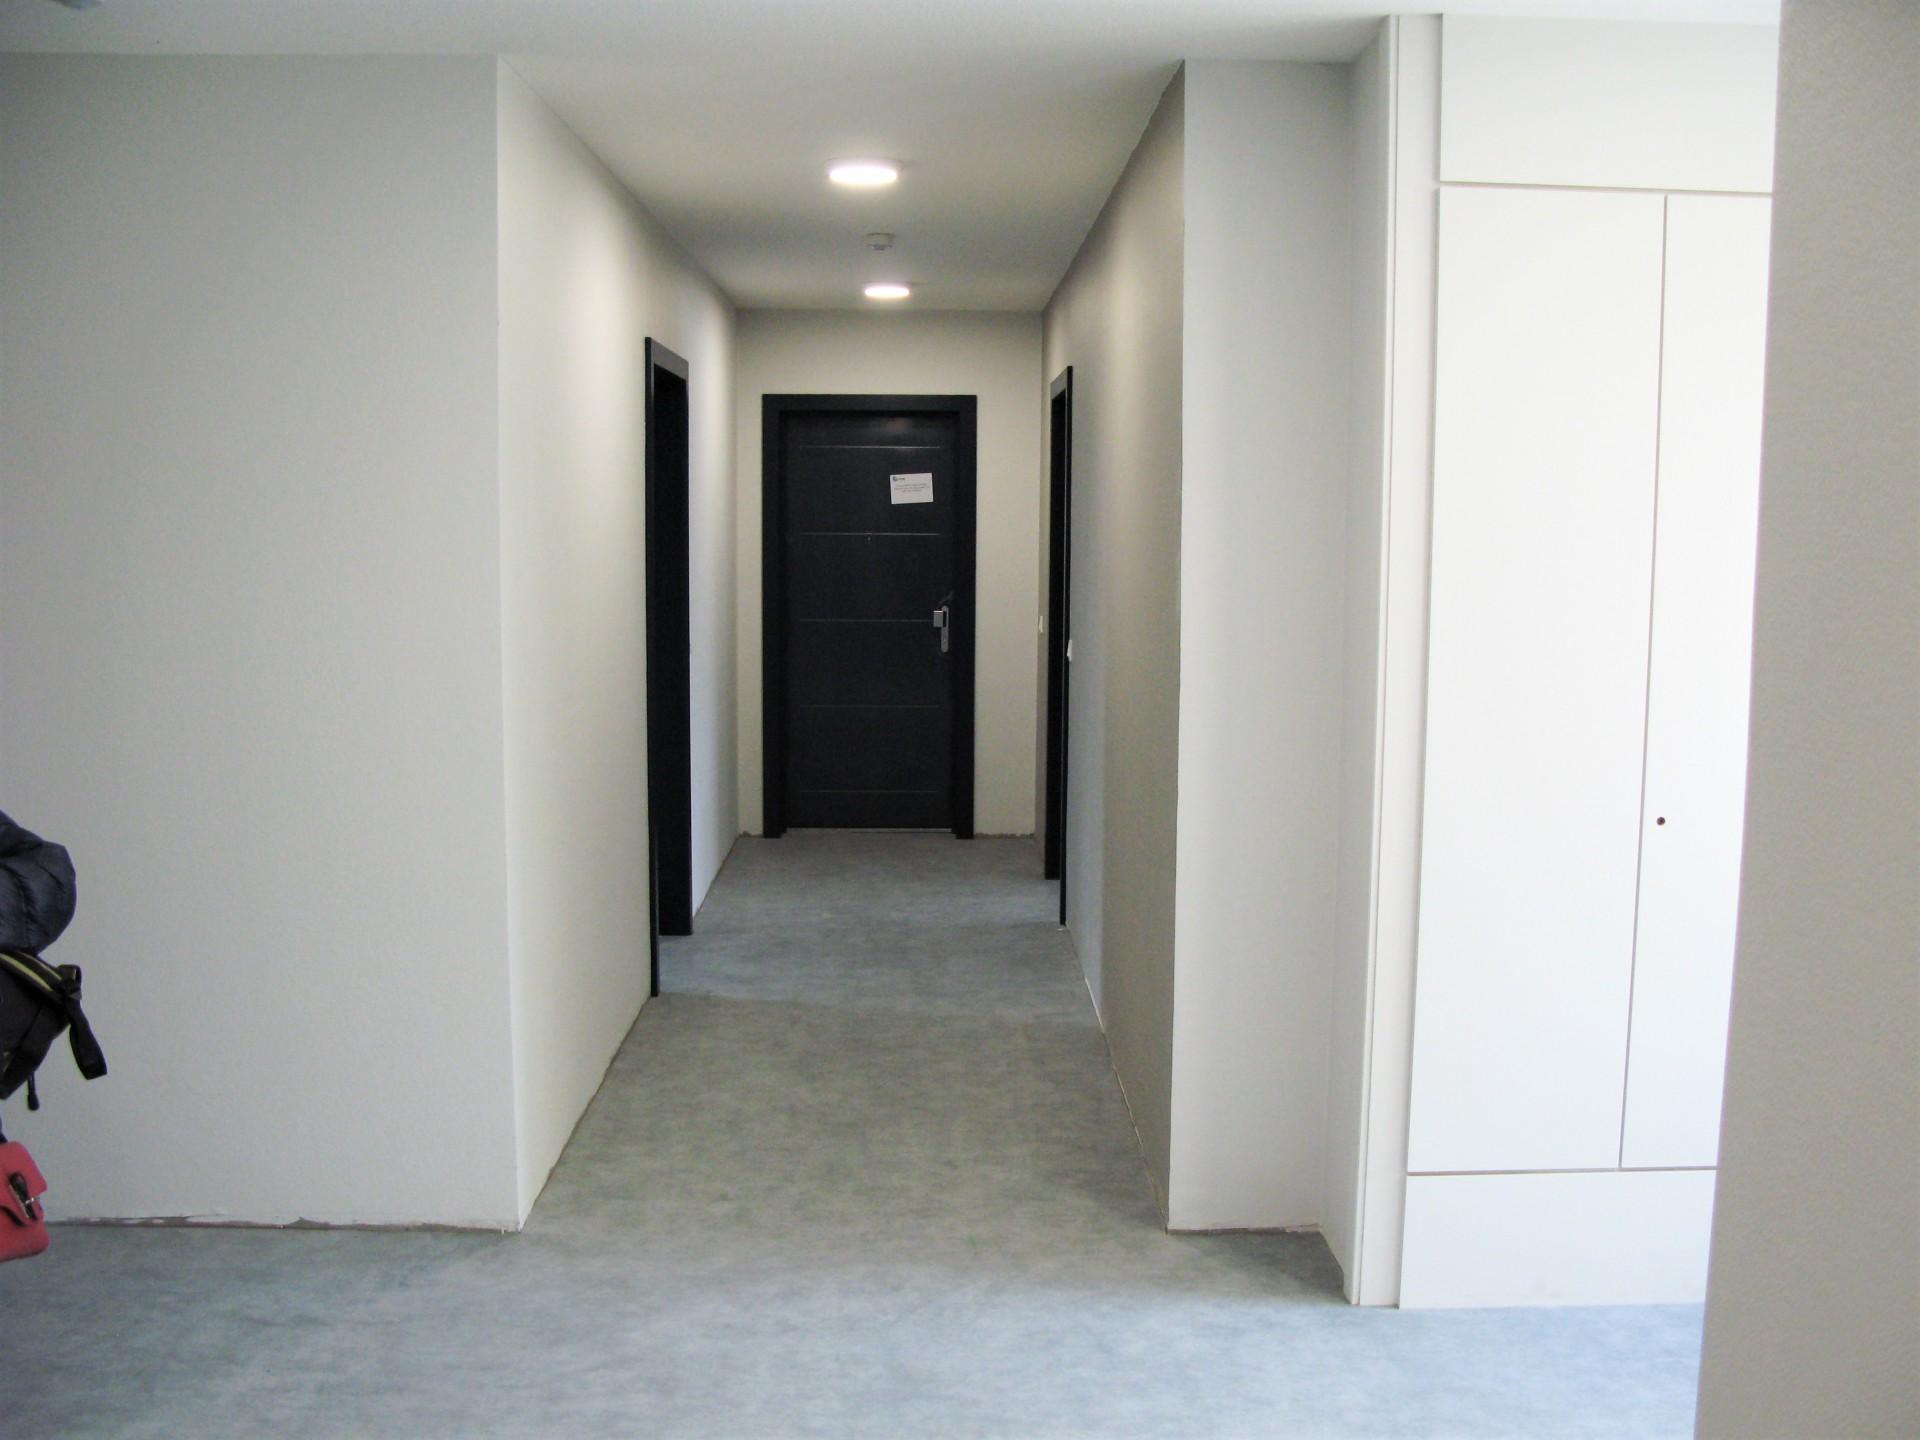 Luxal Bouxwiller LJdC couloir vers appartementsA 20201021